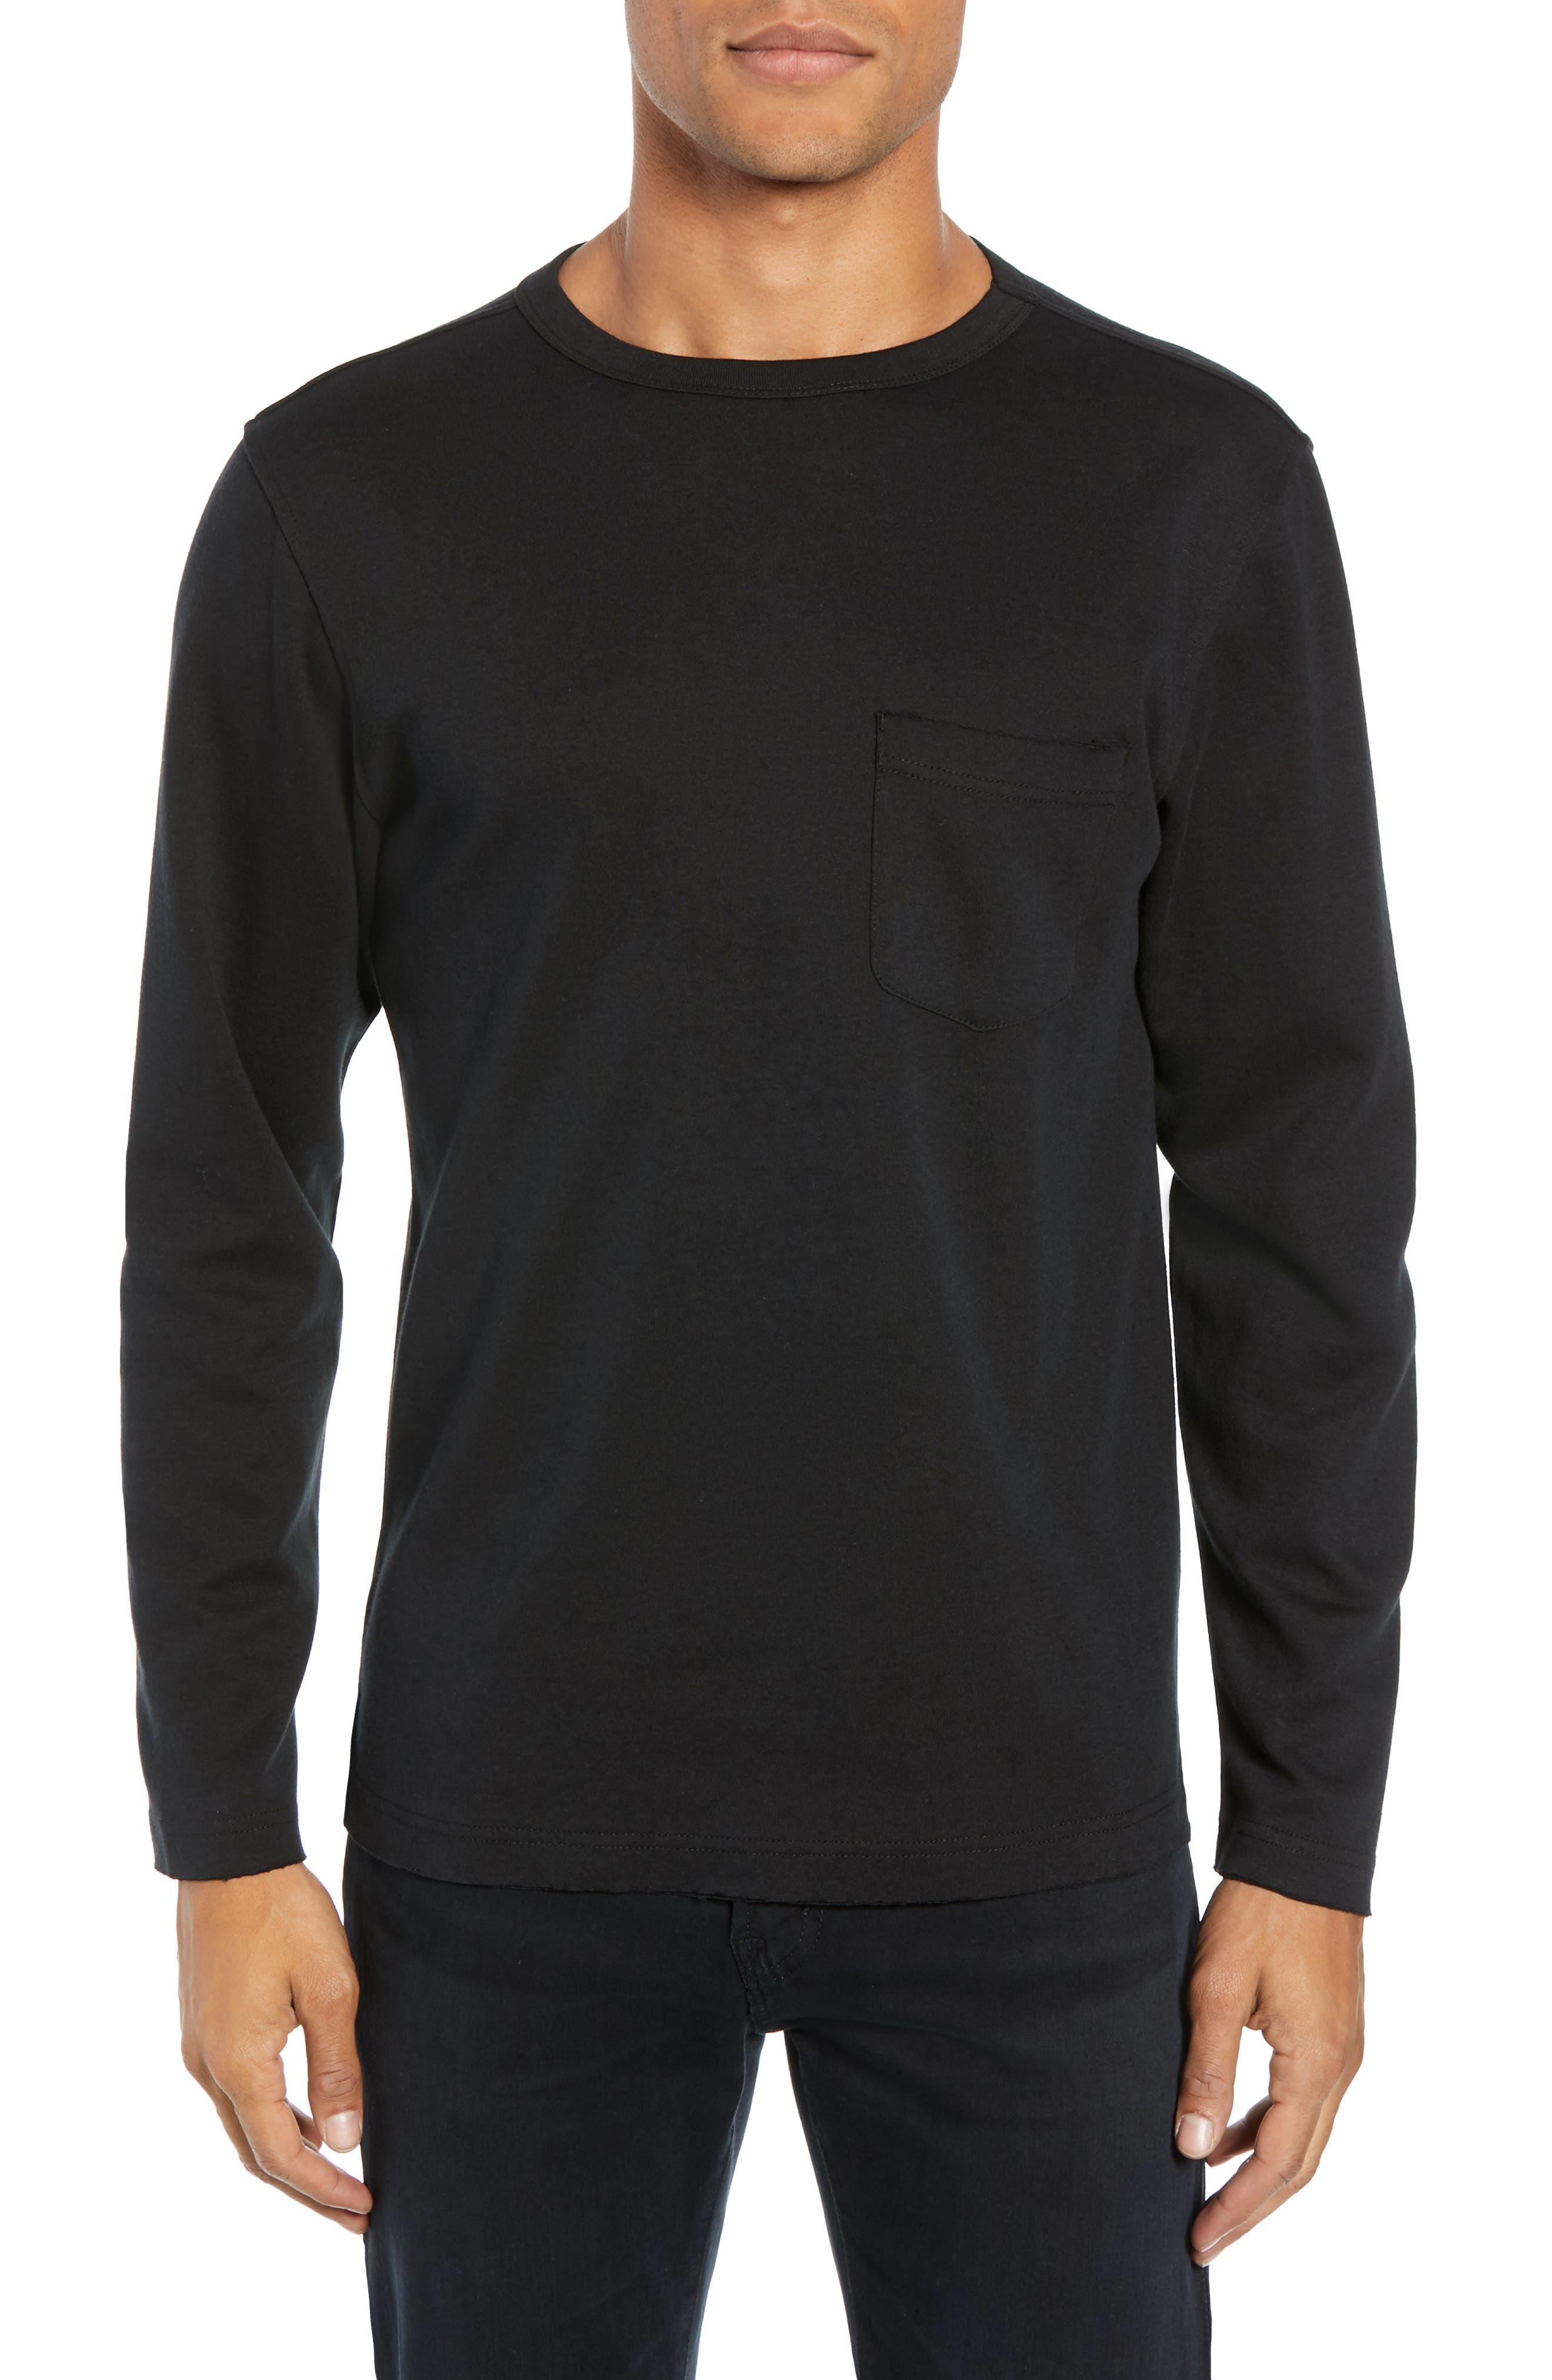 Twentymetrictons Trim Fit Long Sleeve Pocket T-Shirt, Black